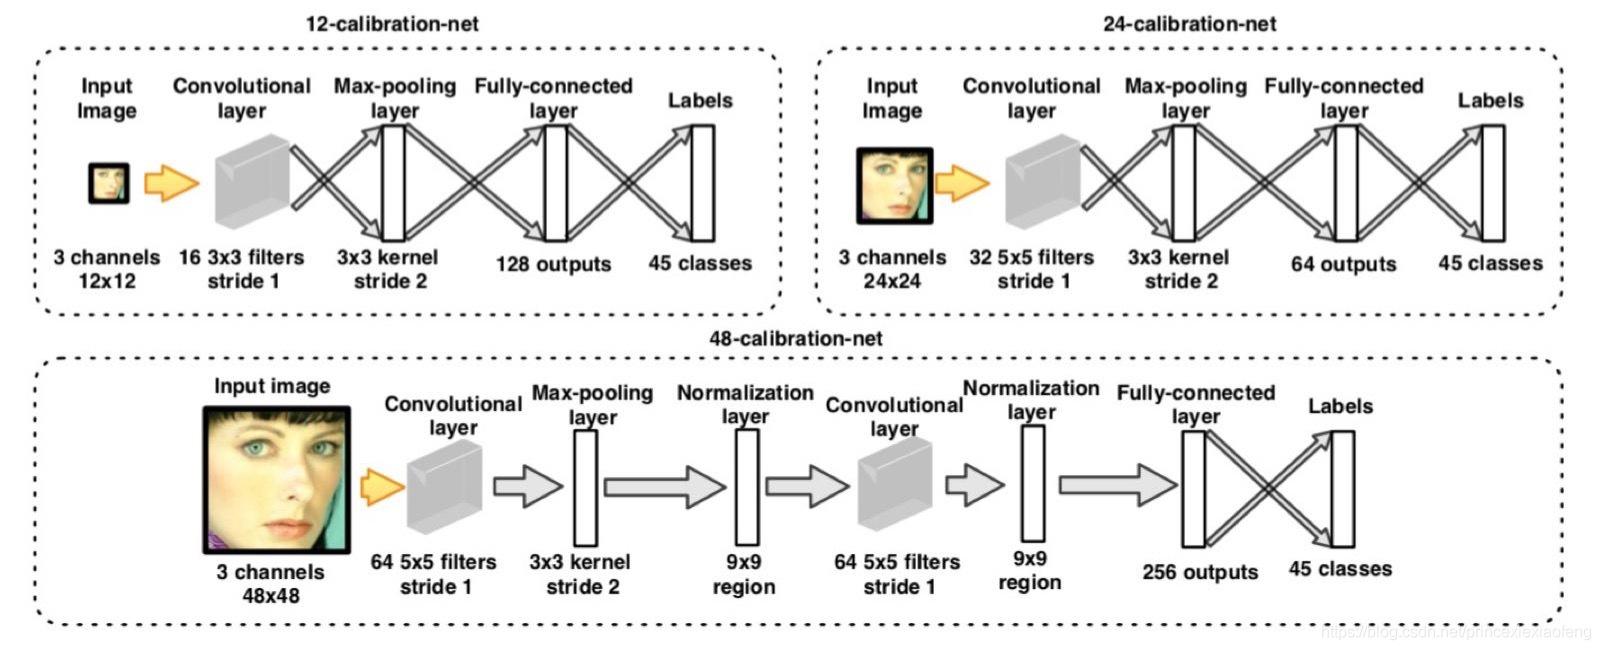 calibration-net网络结构